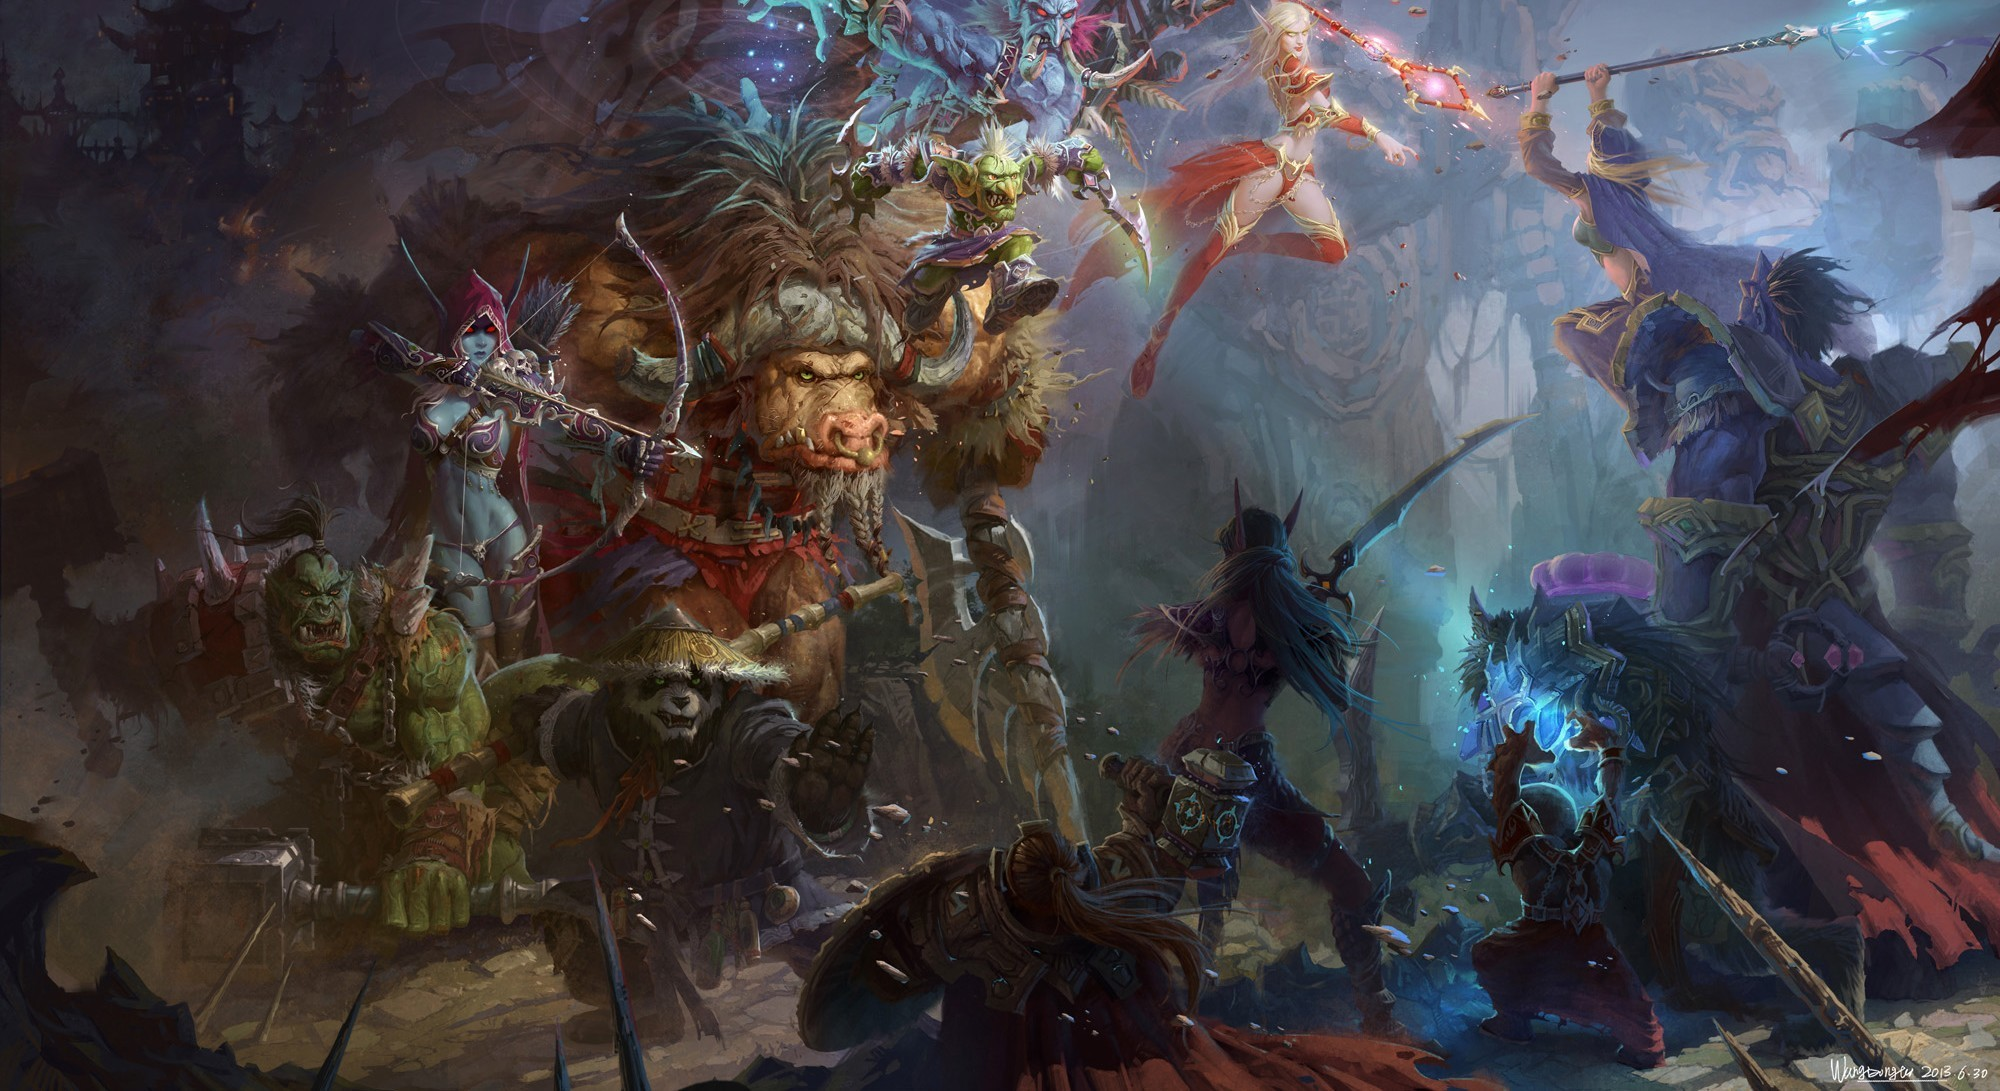 World of Warcraft Lady Sylvanas Windrunner | world of warcraft wow forsaken  queen sylvanas windrunner model